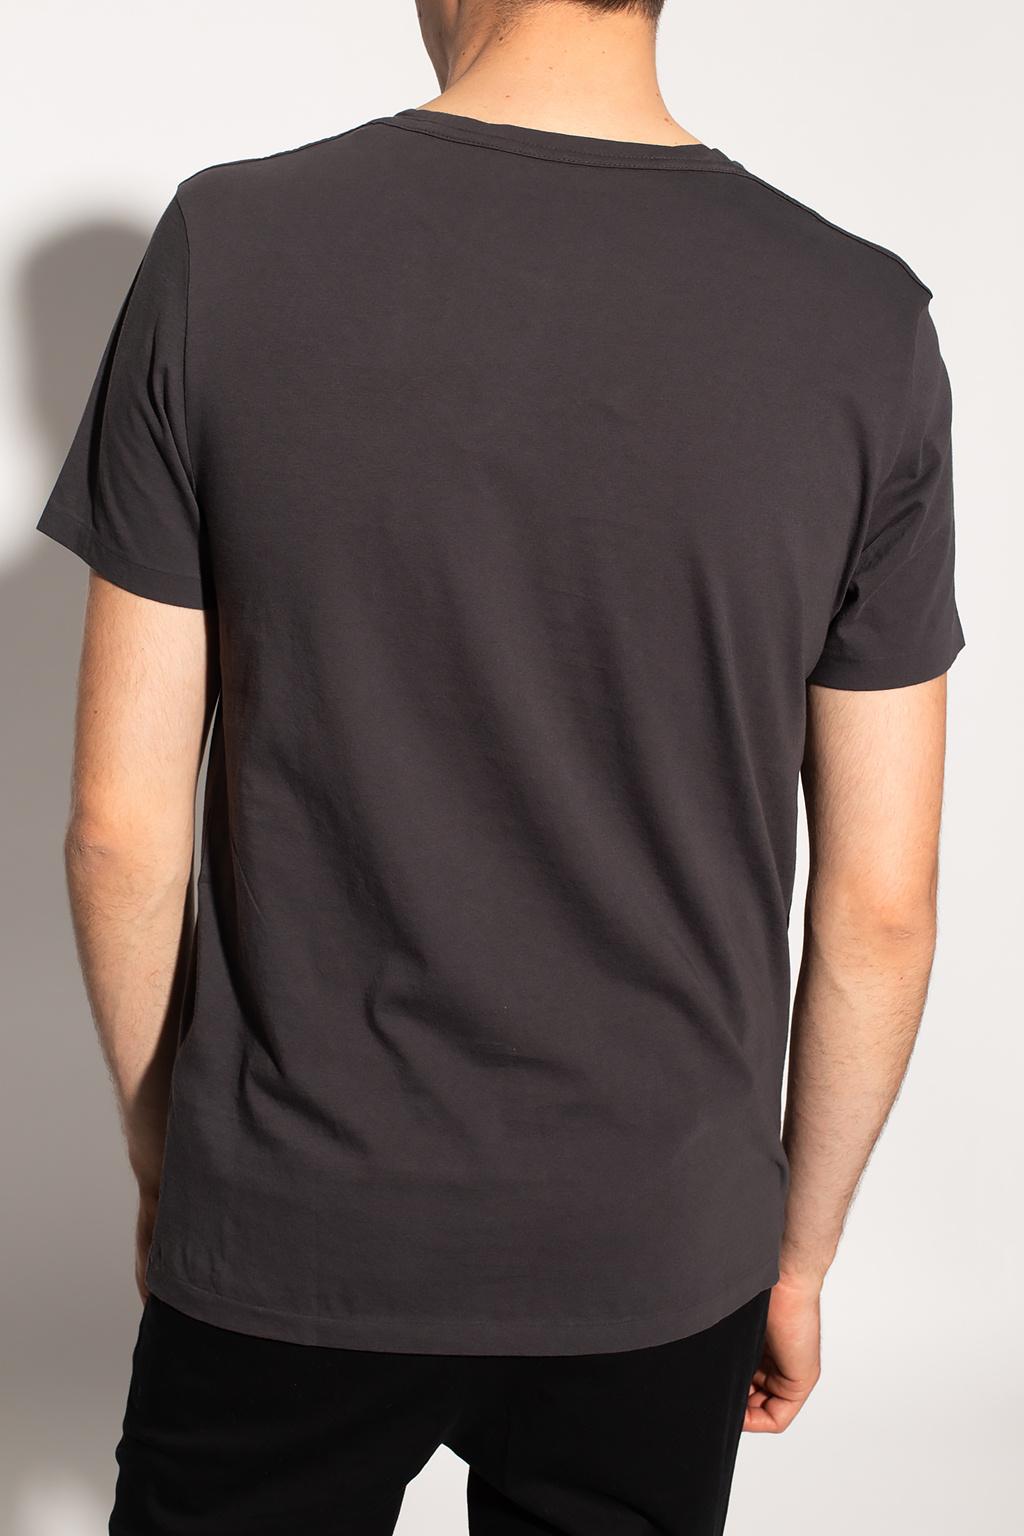 AllSaints 'Lobke' T-shirt